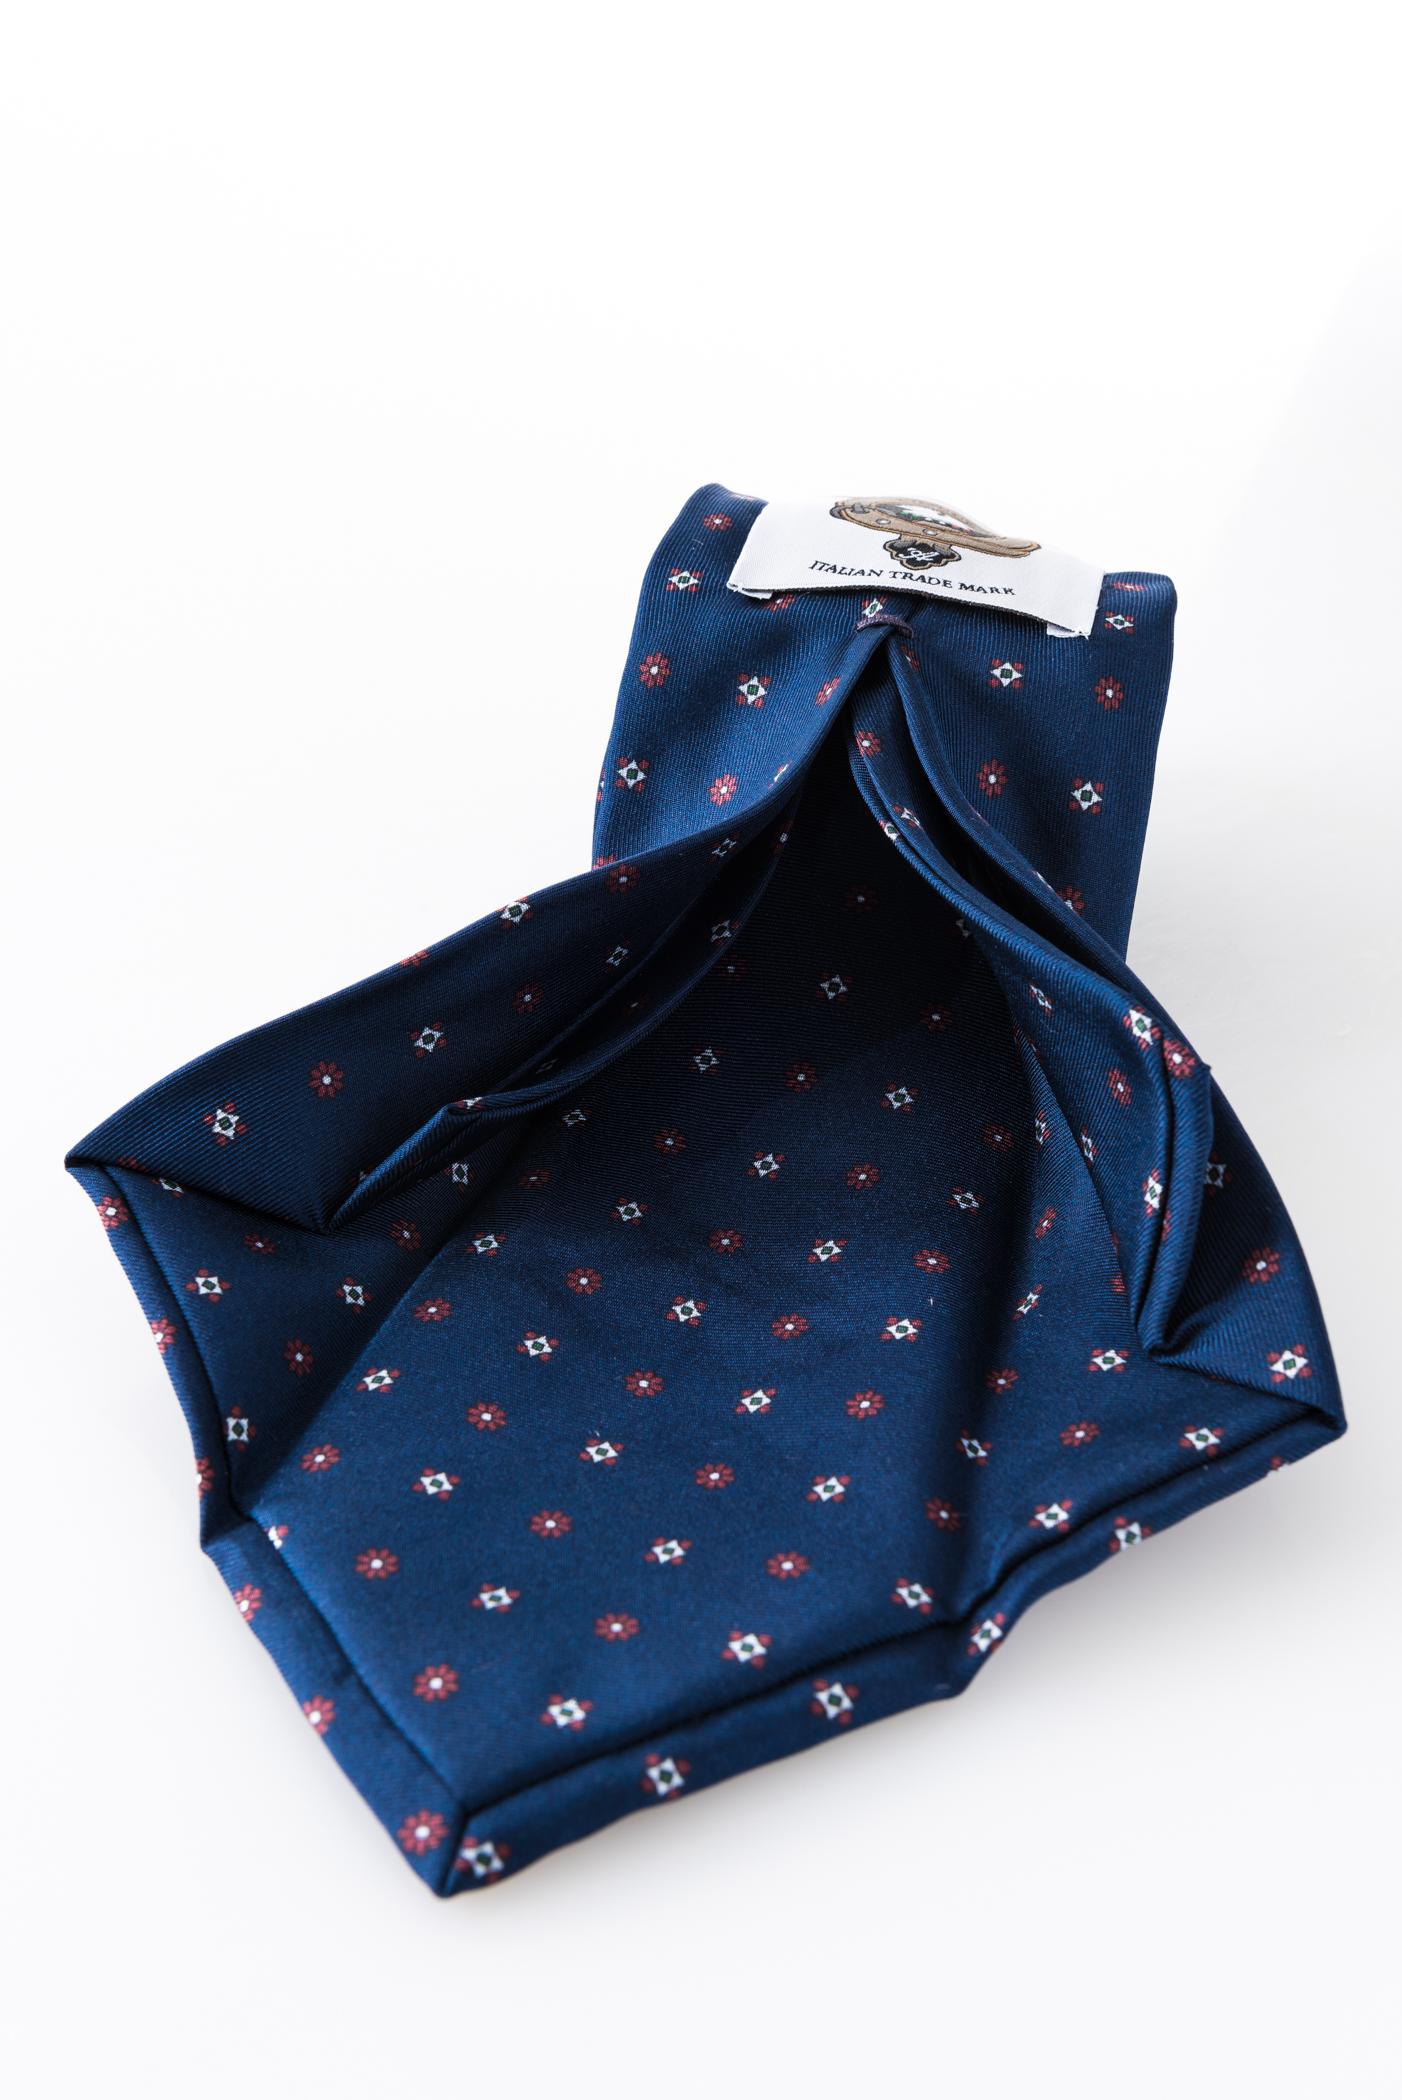 Seven-fold Tie – Susanna Blu – seven-fold detail